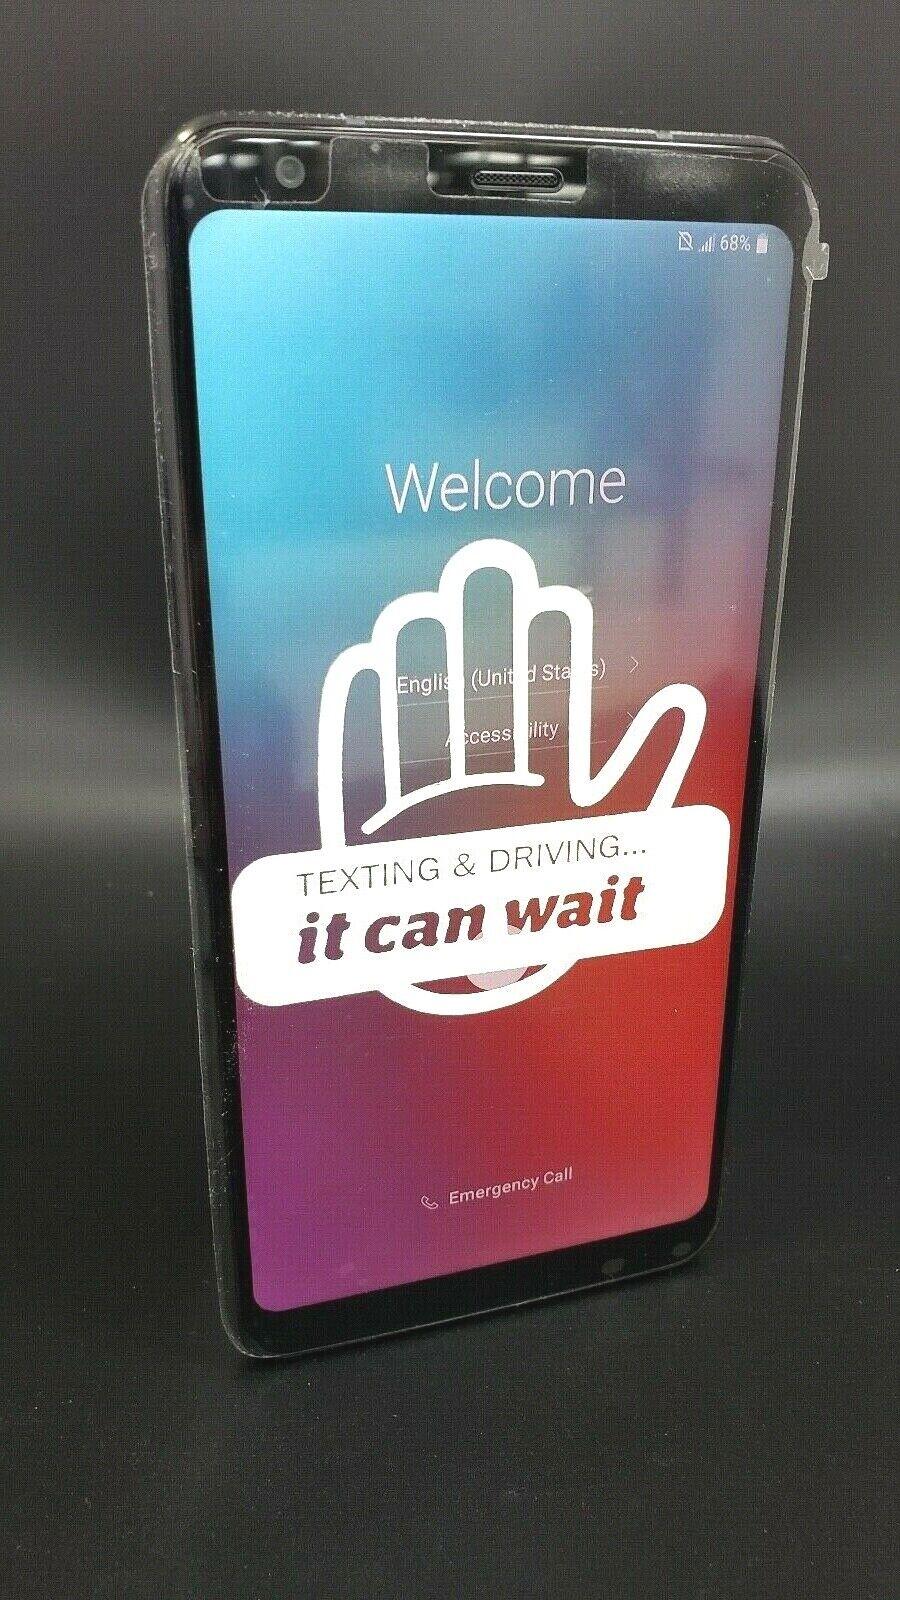 Android Phone - LG Stylo 4 32GB Aurora Black Smartphone Unlocked Q710AL